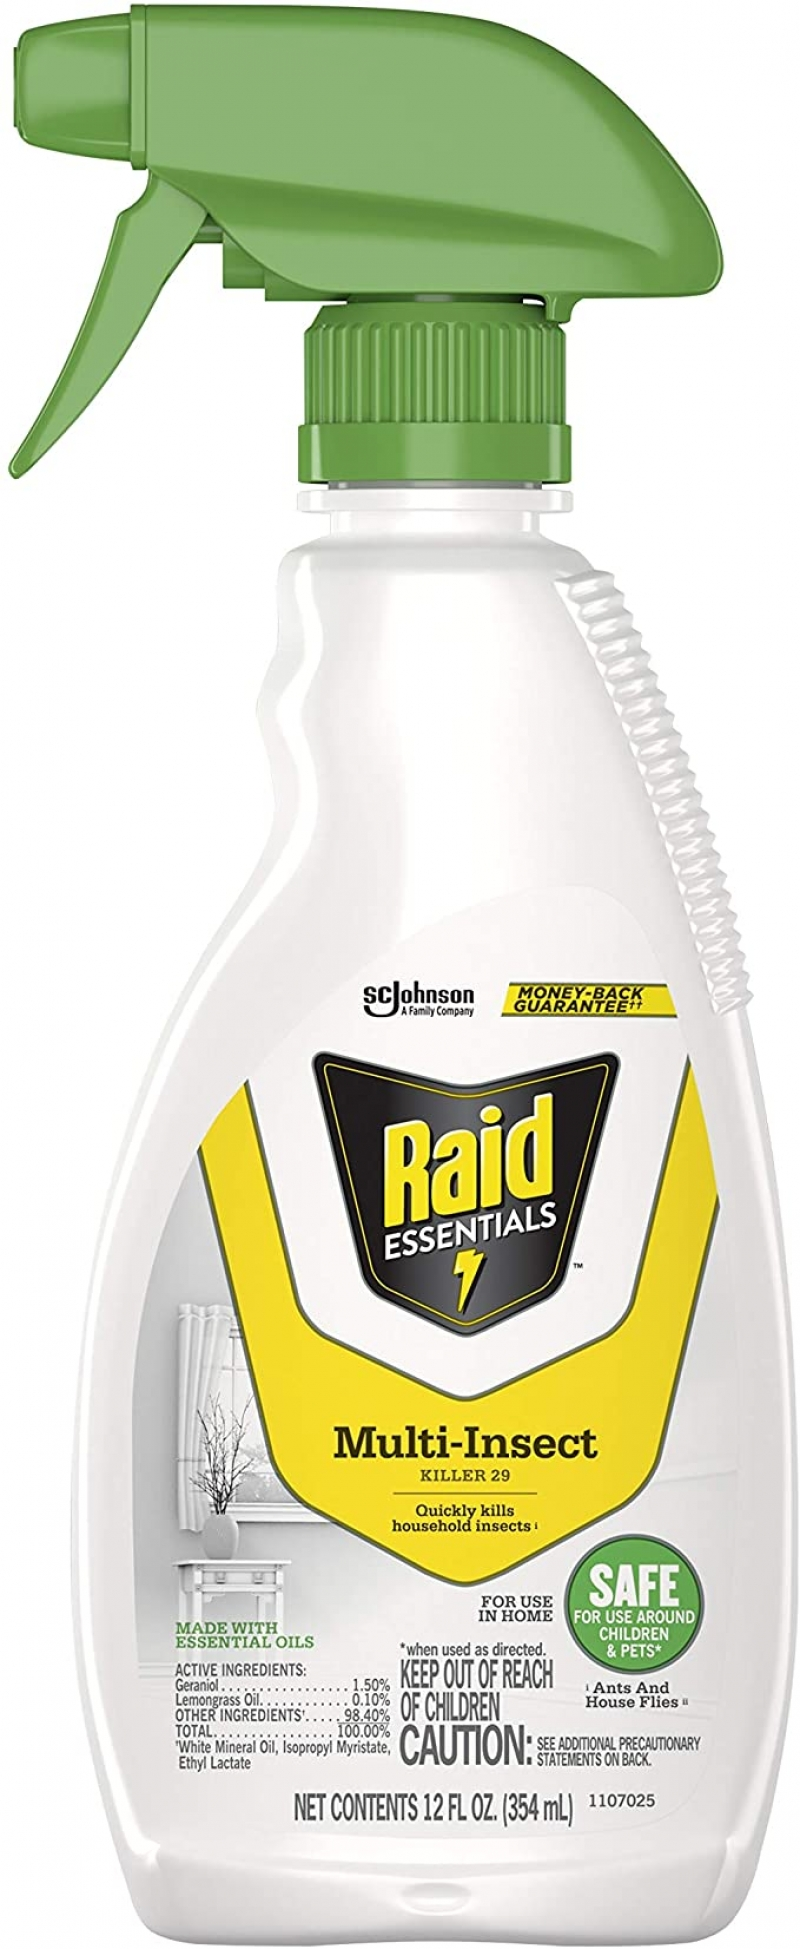 ihocon: Raid Essentials MultiInsect Killer Spray Bottle Child Pet Safe for Indoor Use, 12 Ounce 室內用殺蟲劑(兒童寵物安全)